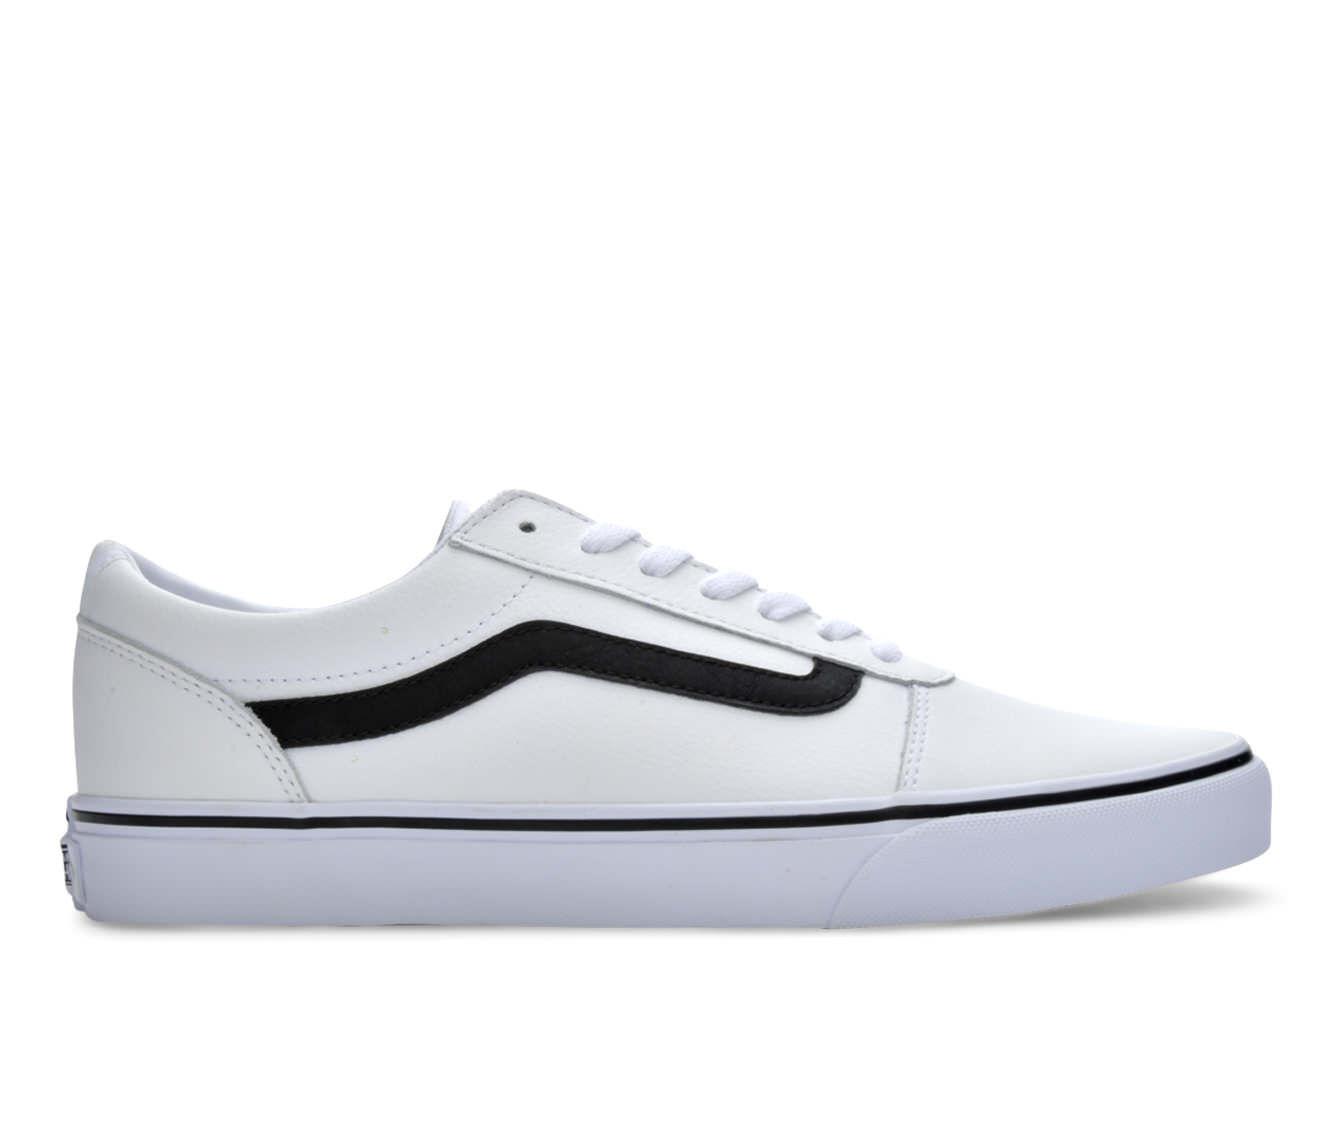 vans white leather